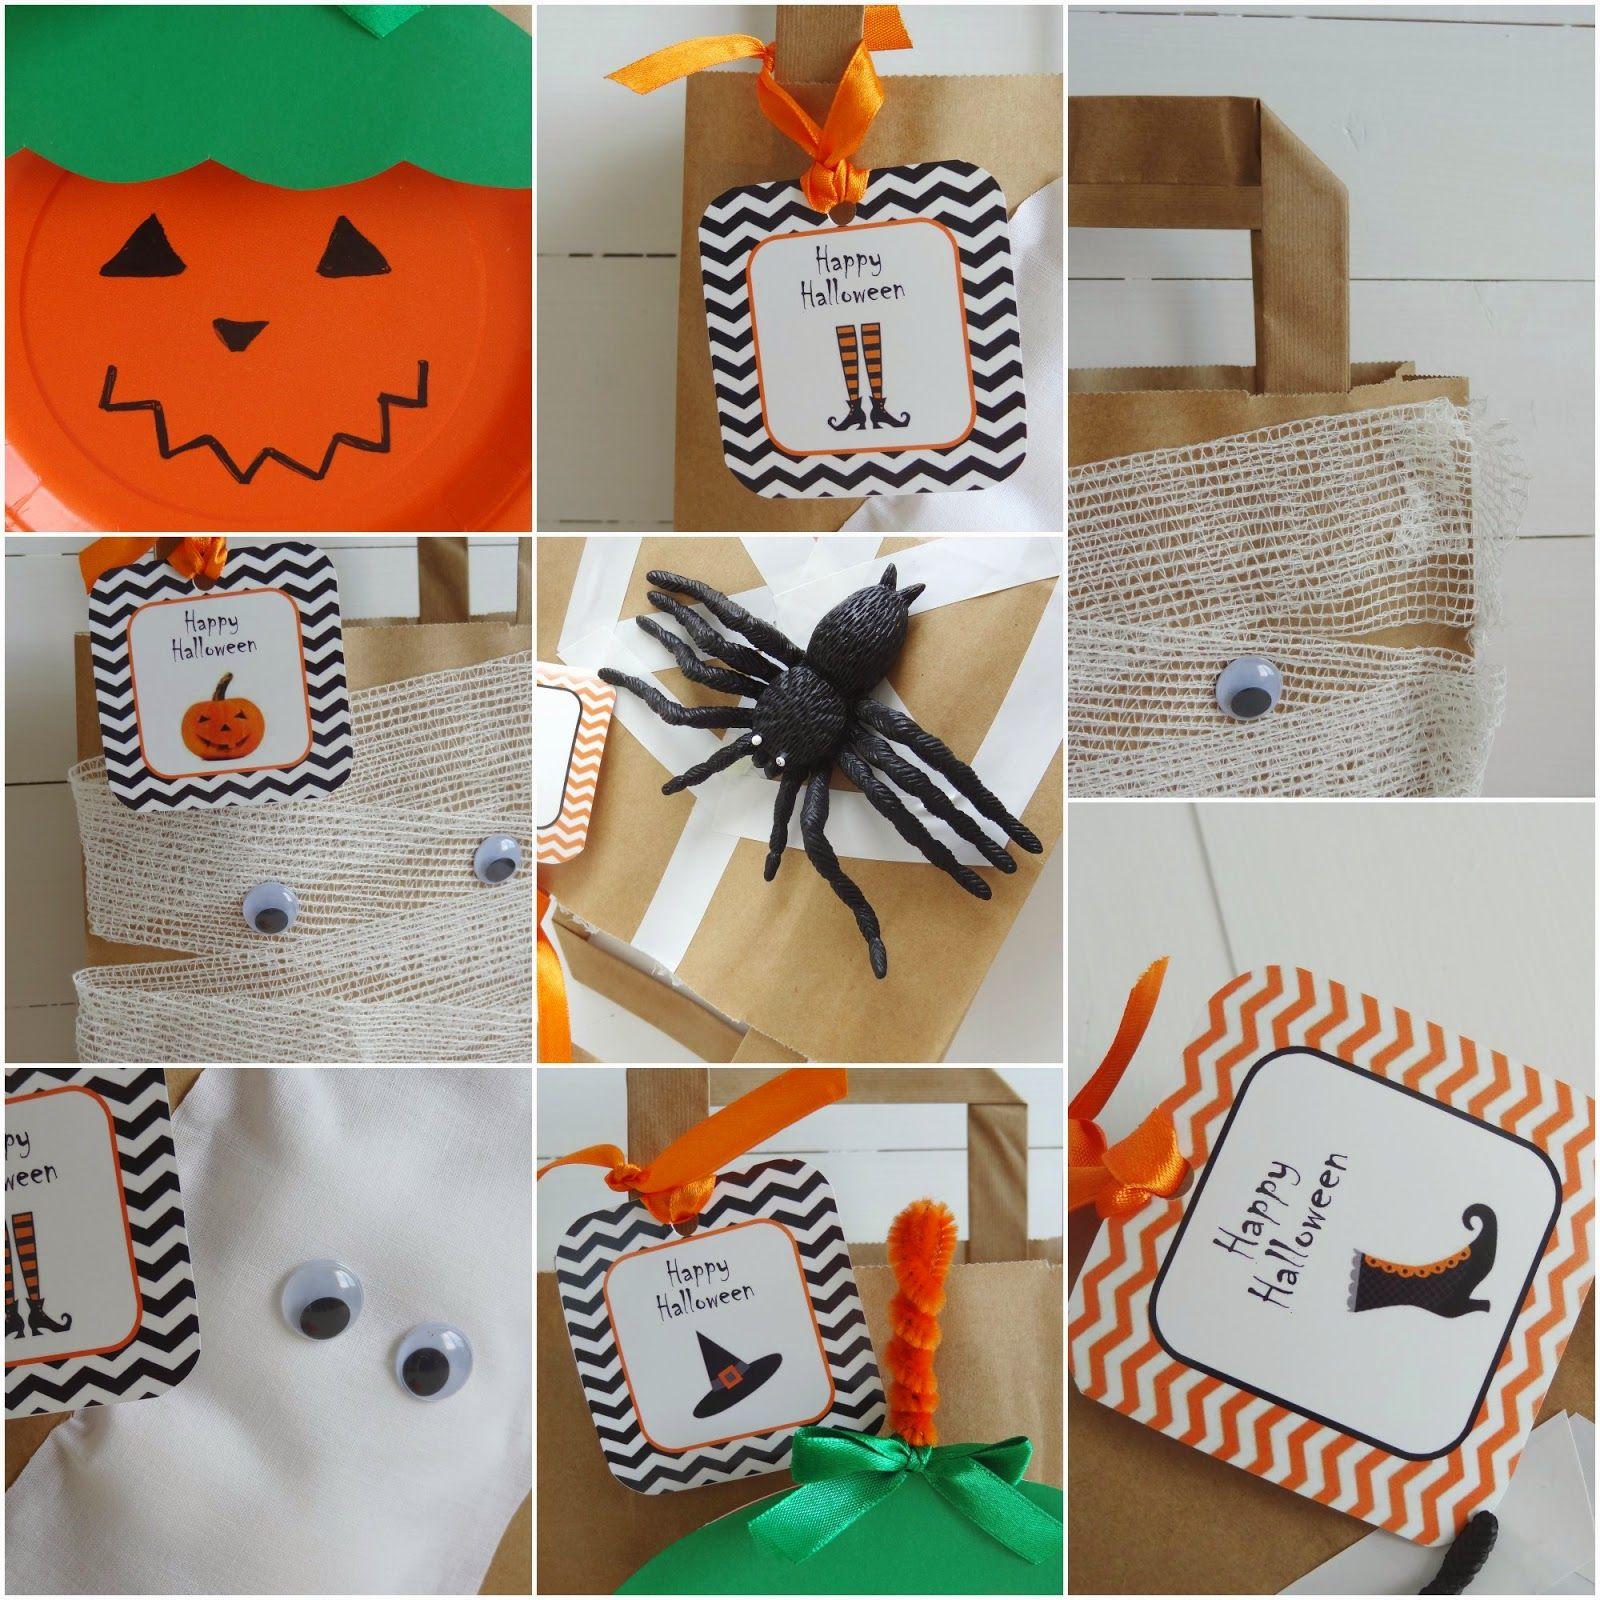 Celebra con Ana: ♥ Bolsas Kraft para Halloween y Freebie